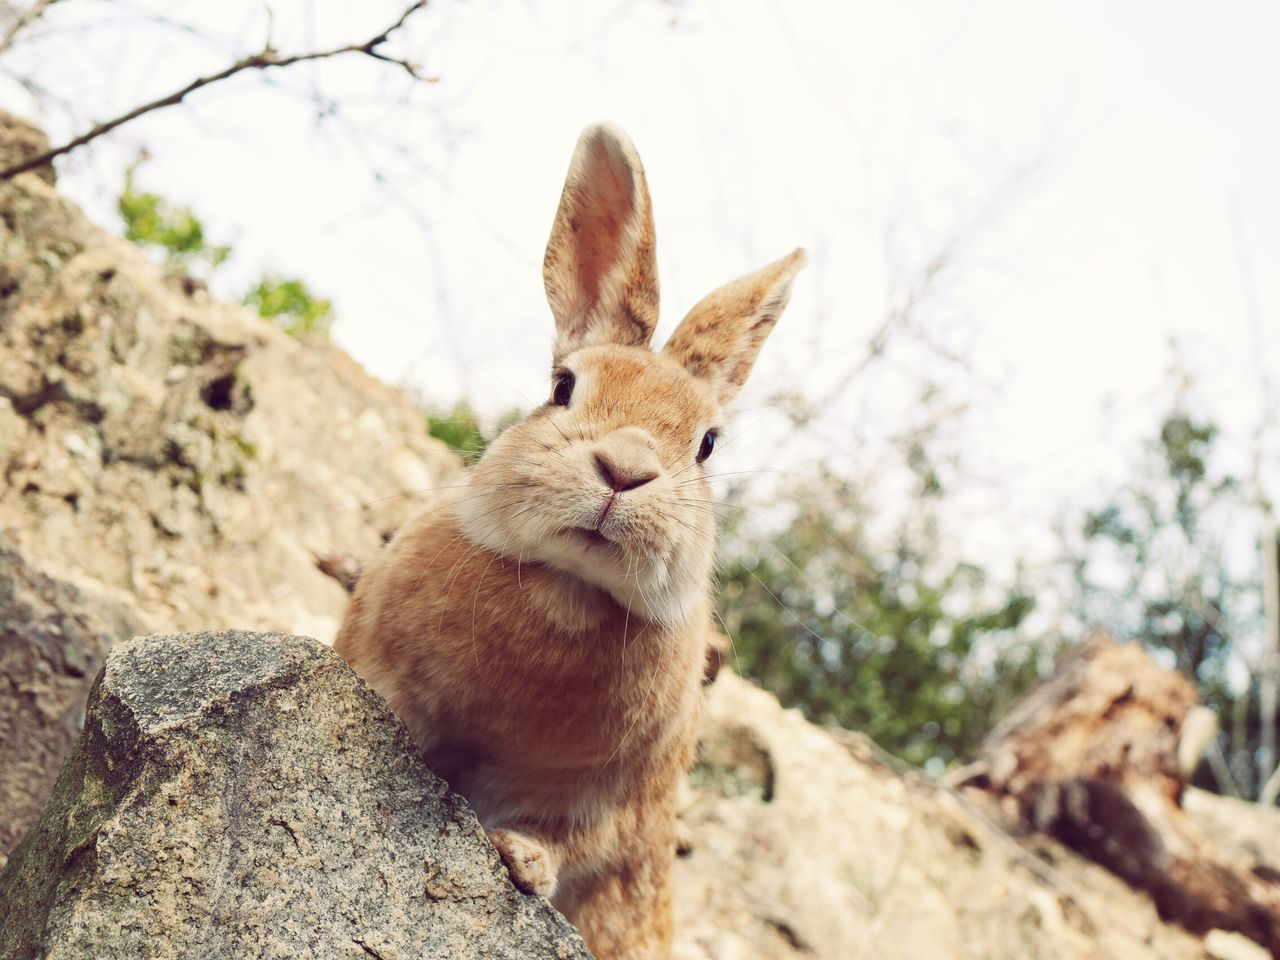 Rabbit Rabbits Rabbit ❤️ Animal Themes Animals In The Wild Animals Animal Animal Wildlife Animal Head  Animal Photography Nature_collection Nature Photography Japanese  Pretty Nature Beauty In Nature Cute